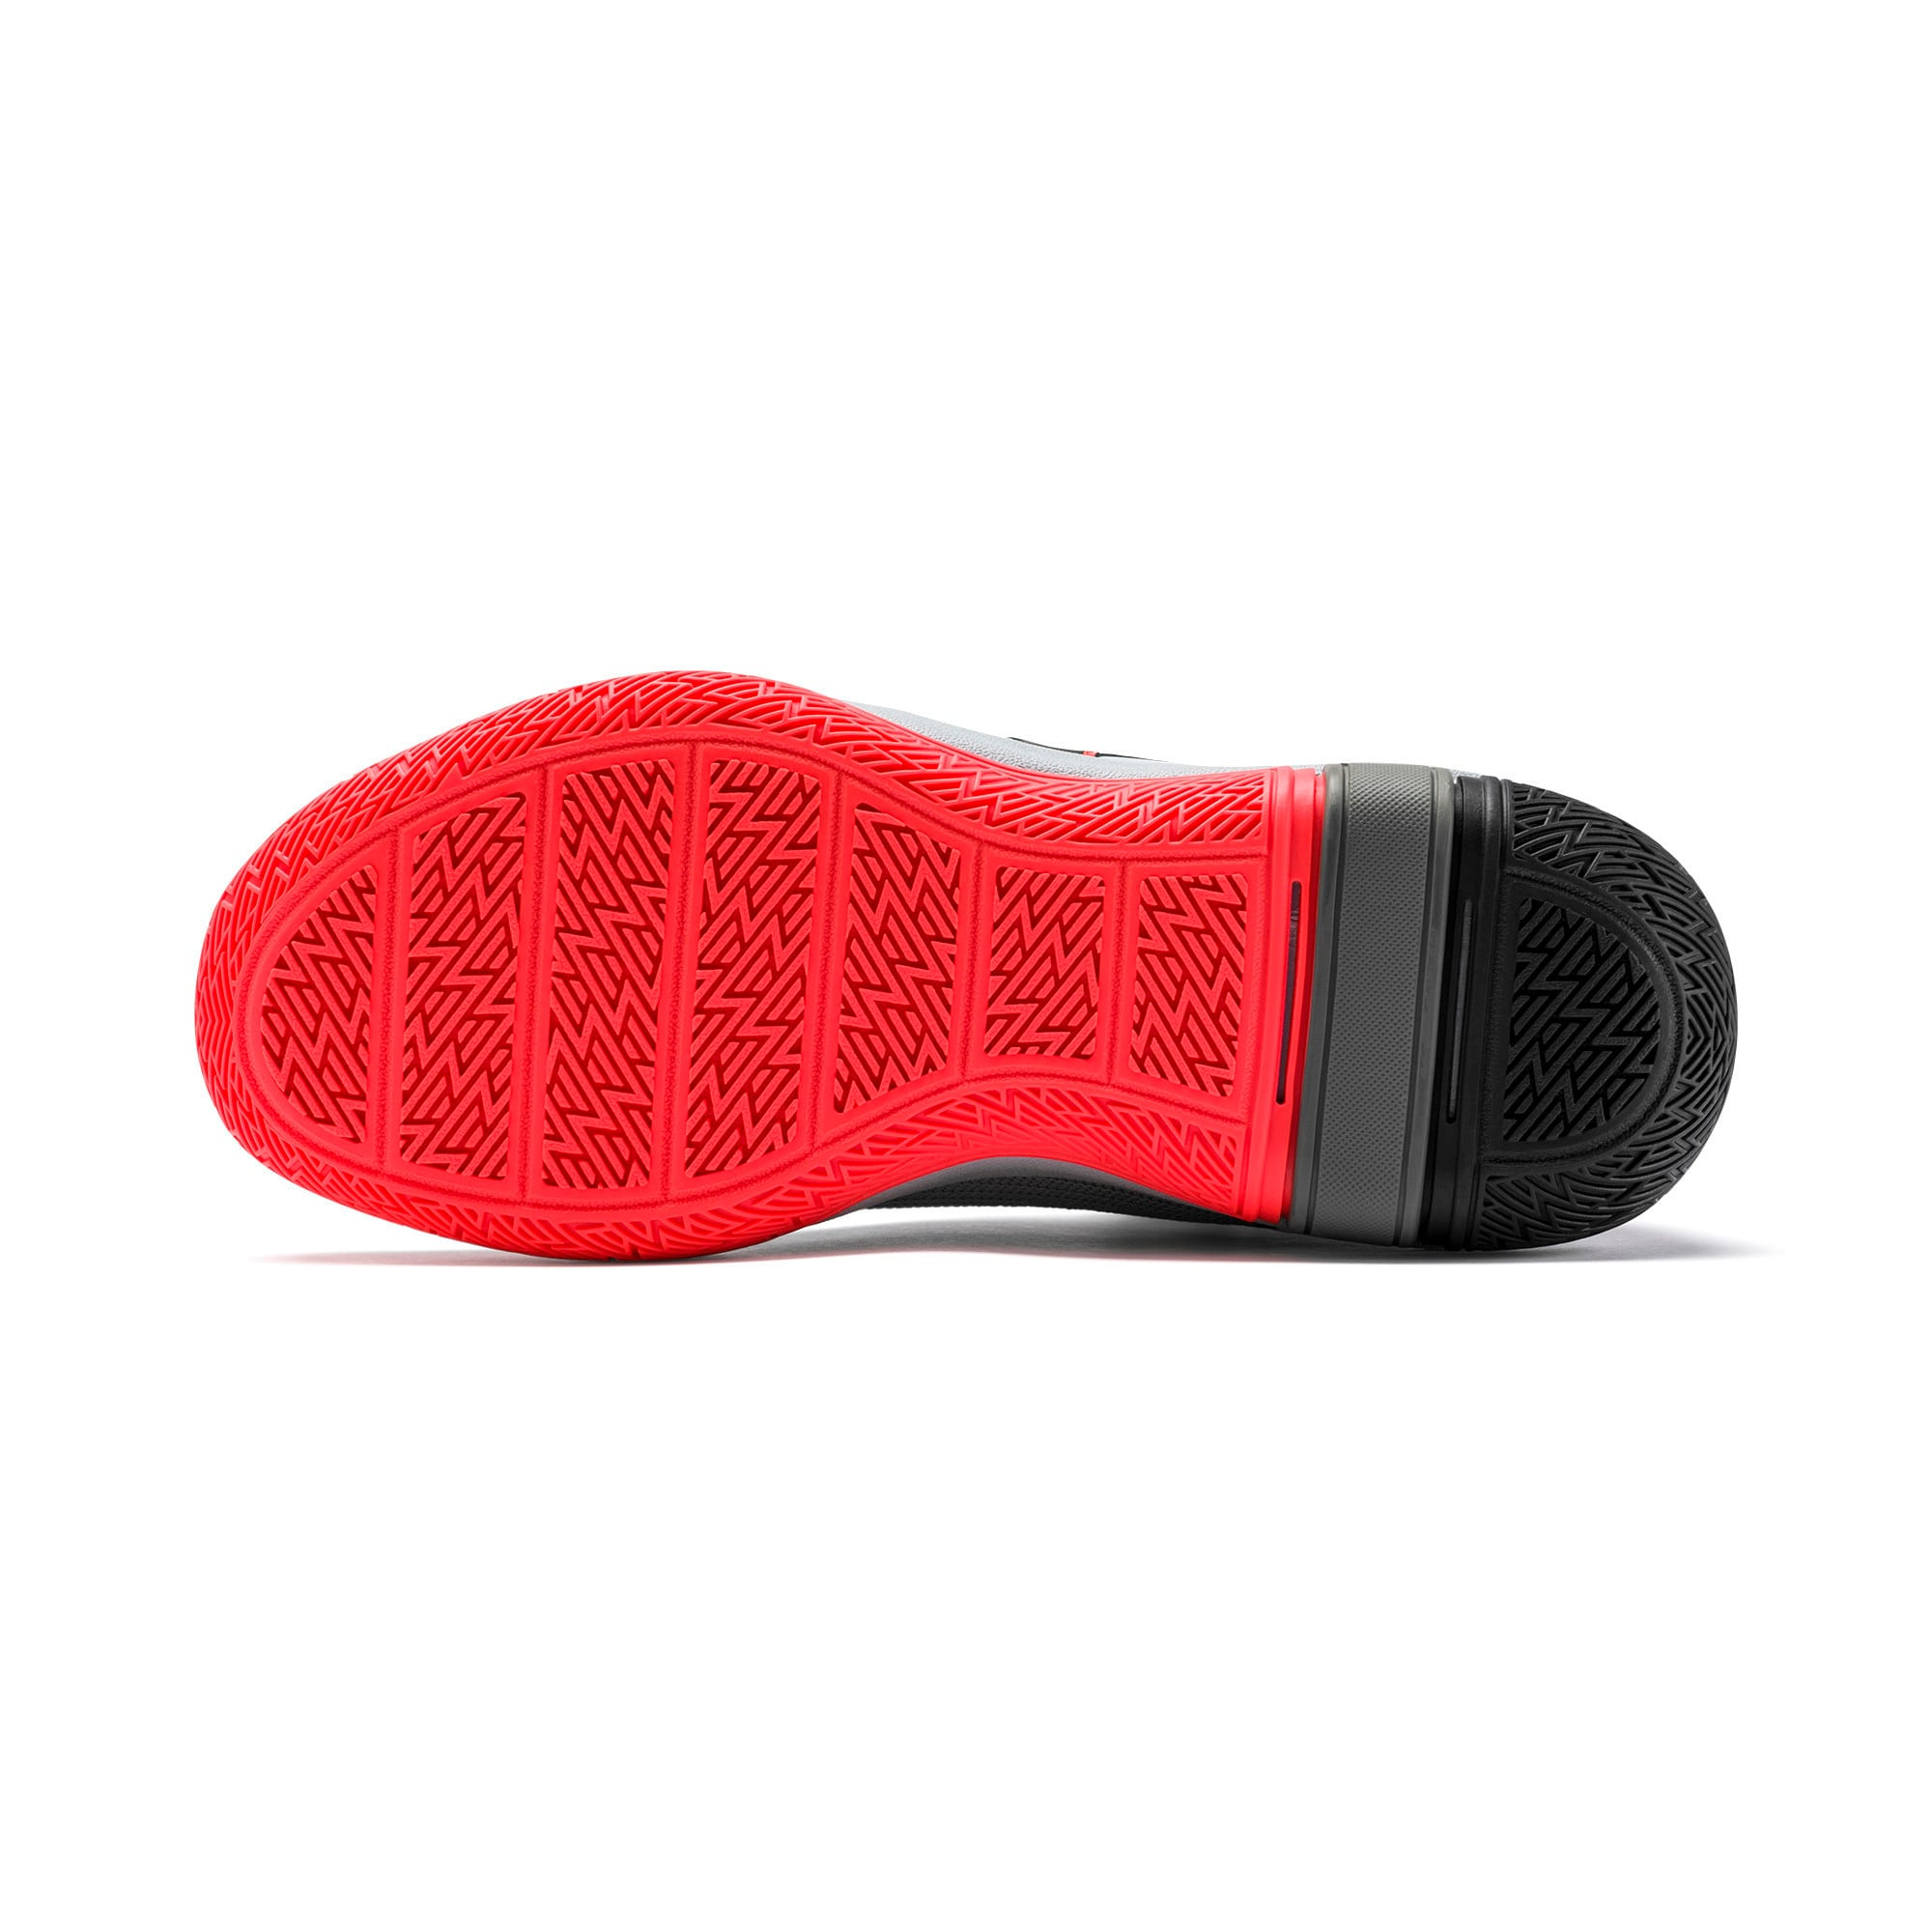 Thumbnail 4 of Legacy Disrupt Basketball Shoes JR, Puma Black-Red Blast, medium